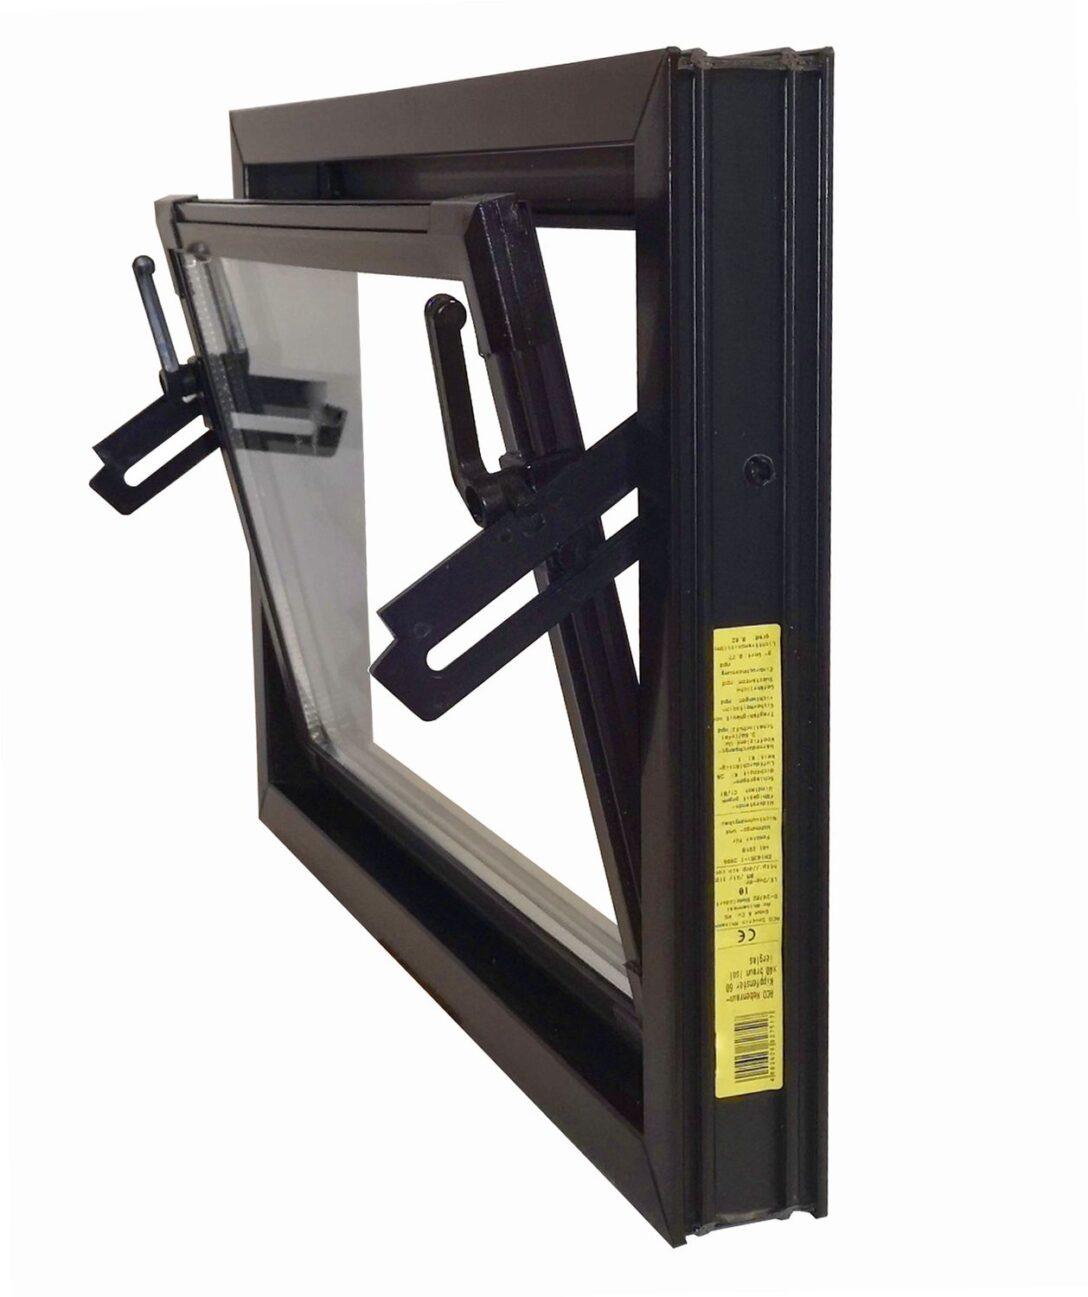 Large Size of Aco Kellerfenster Ersatzteile Therm 80cm Nebenraumfenster Kippfenster Isoglas Braun Fenster Velux Wohnzimmer Aco Kellerfenster Ersatzteile